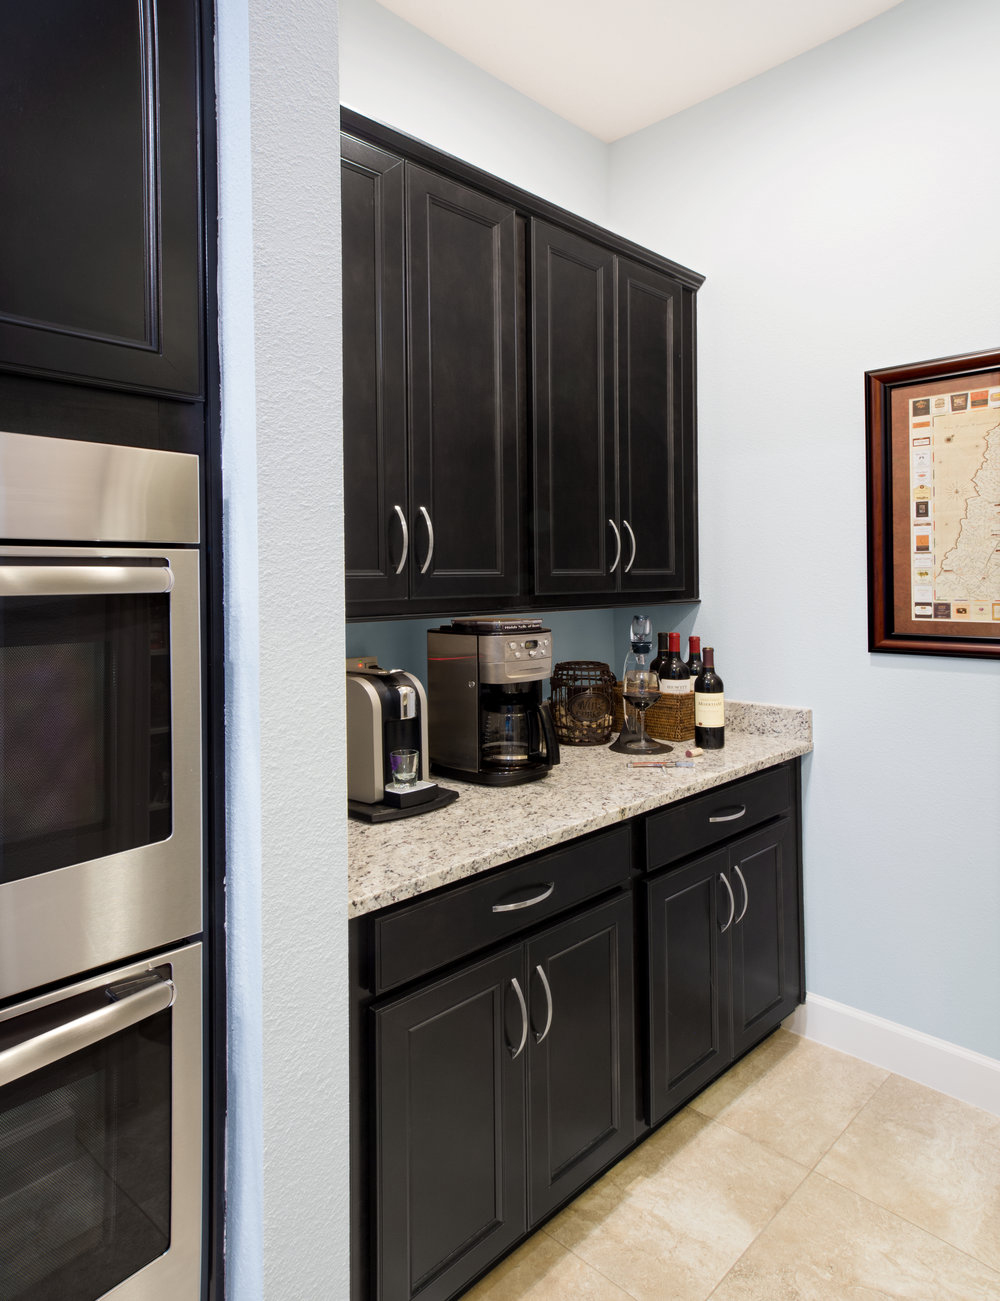 Messy Kitchen, 8585 Mabel Street, Jacksonville, FL.